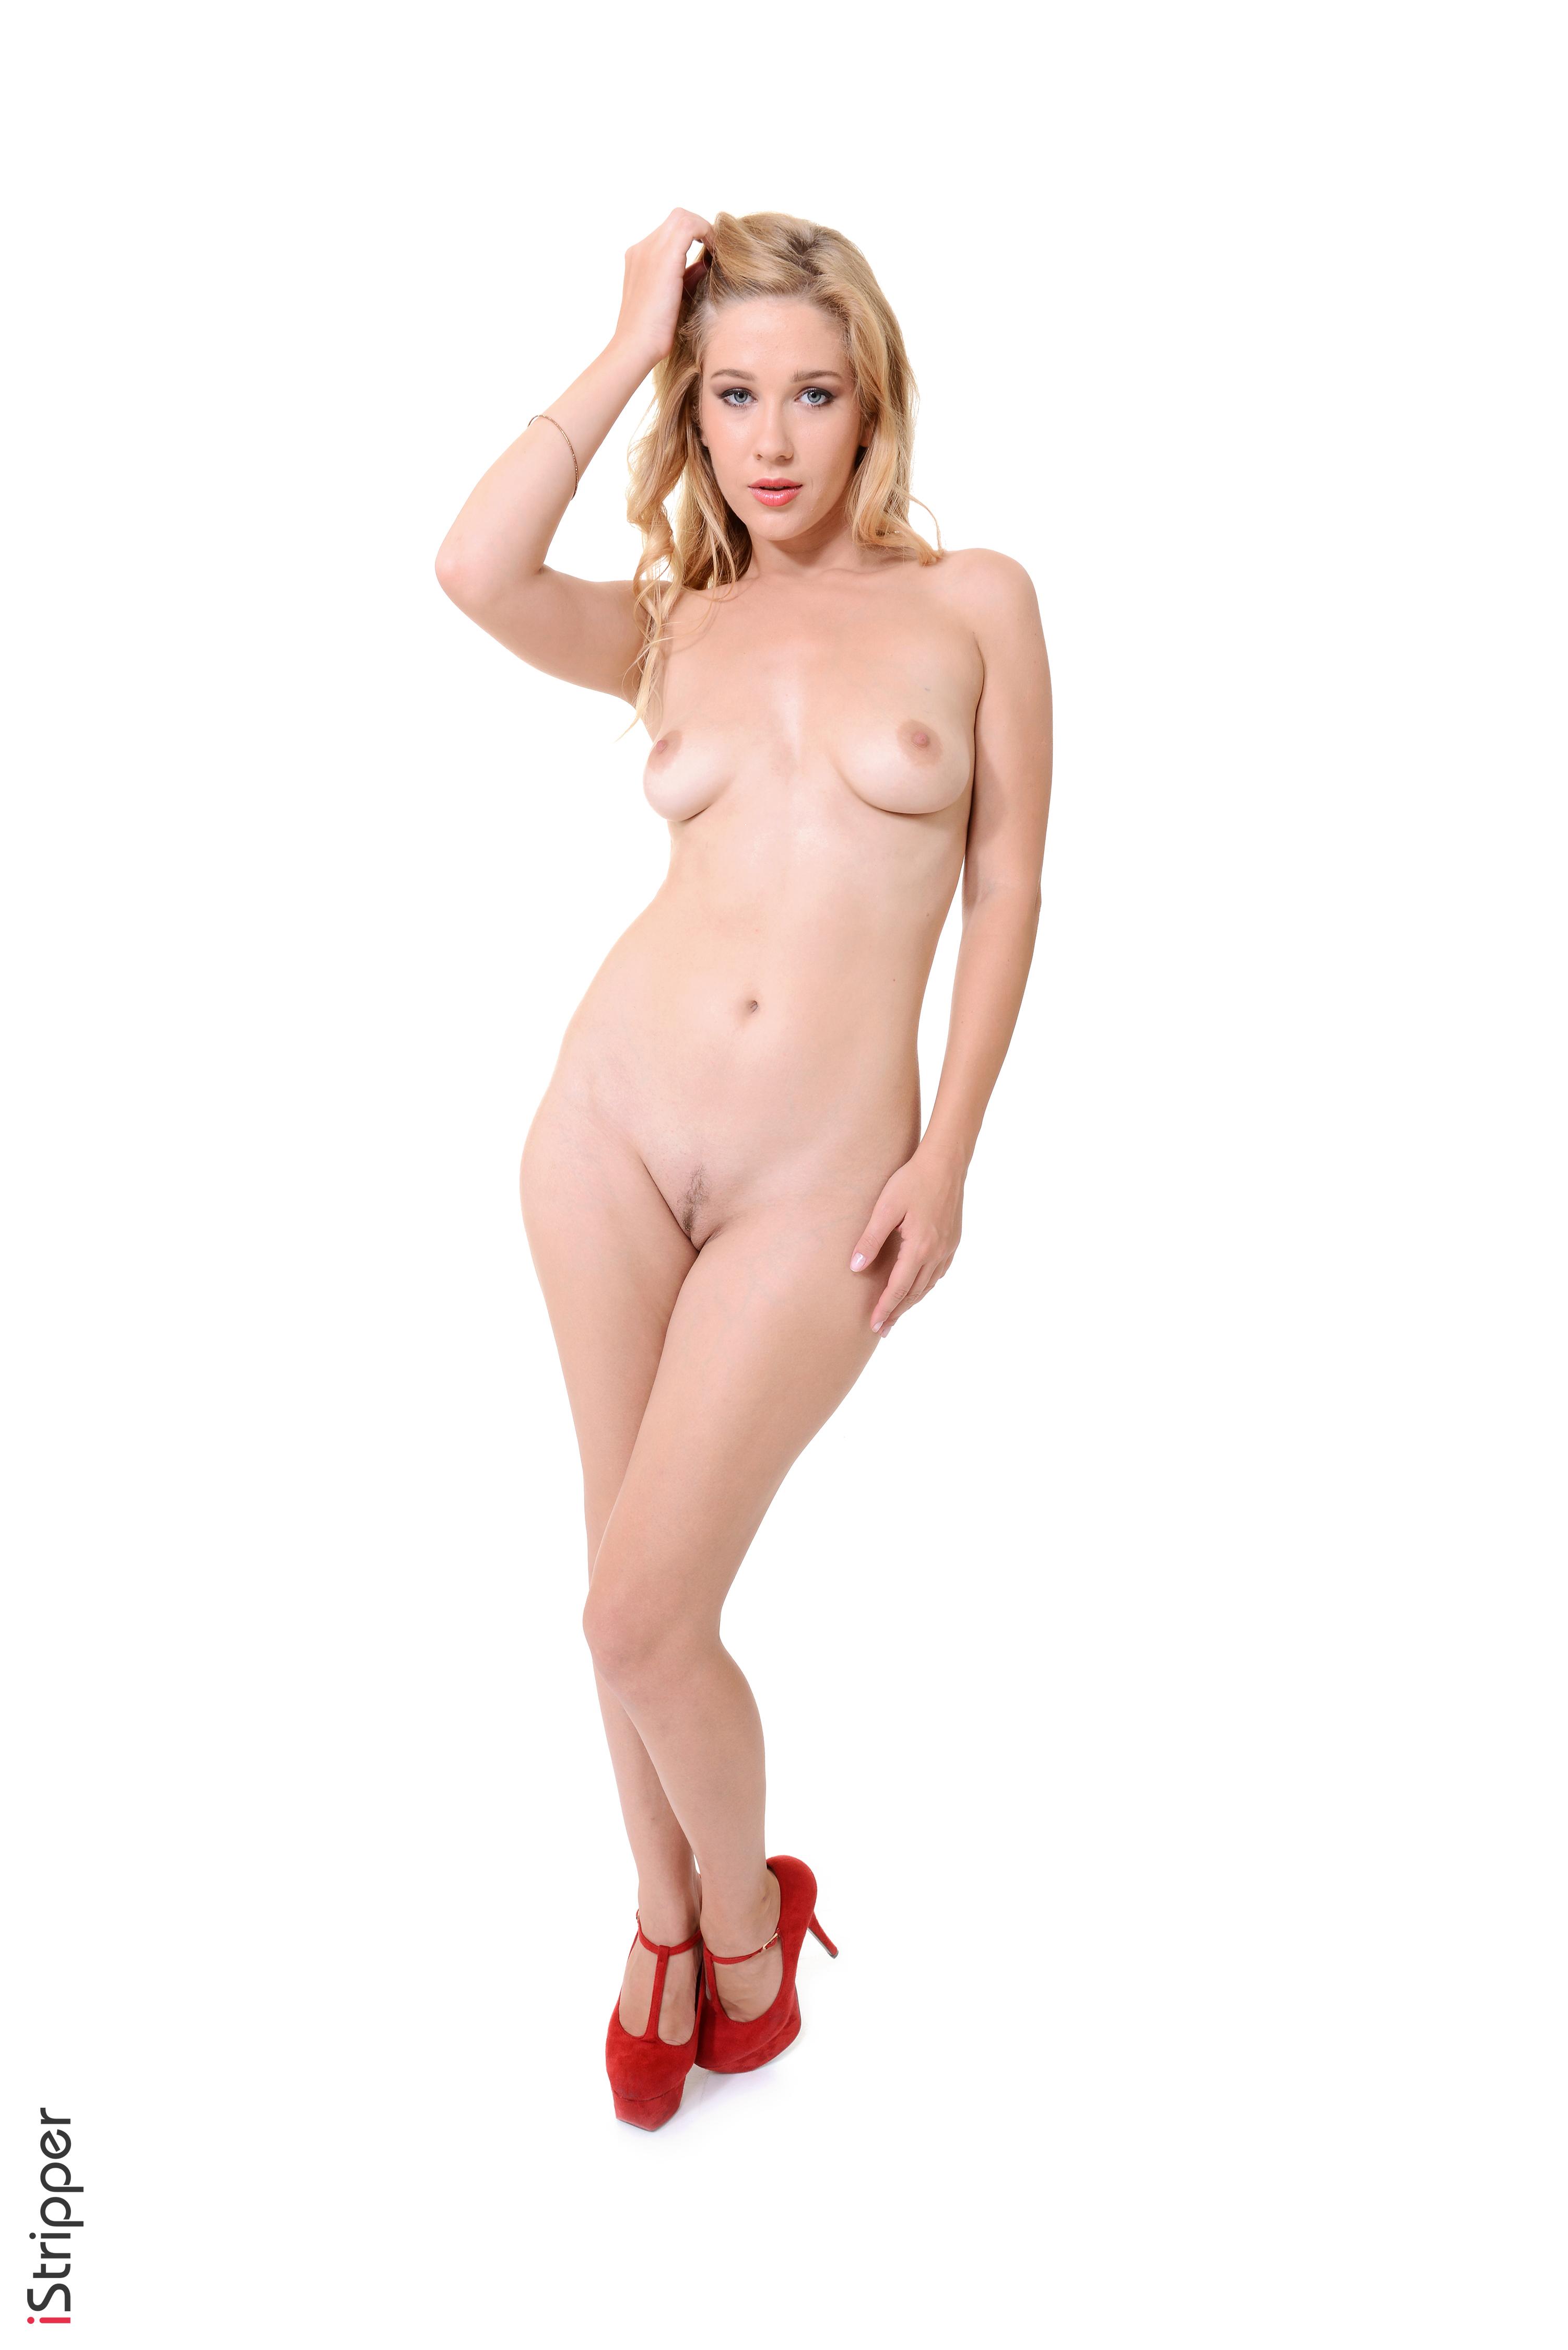 4k erotic